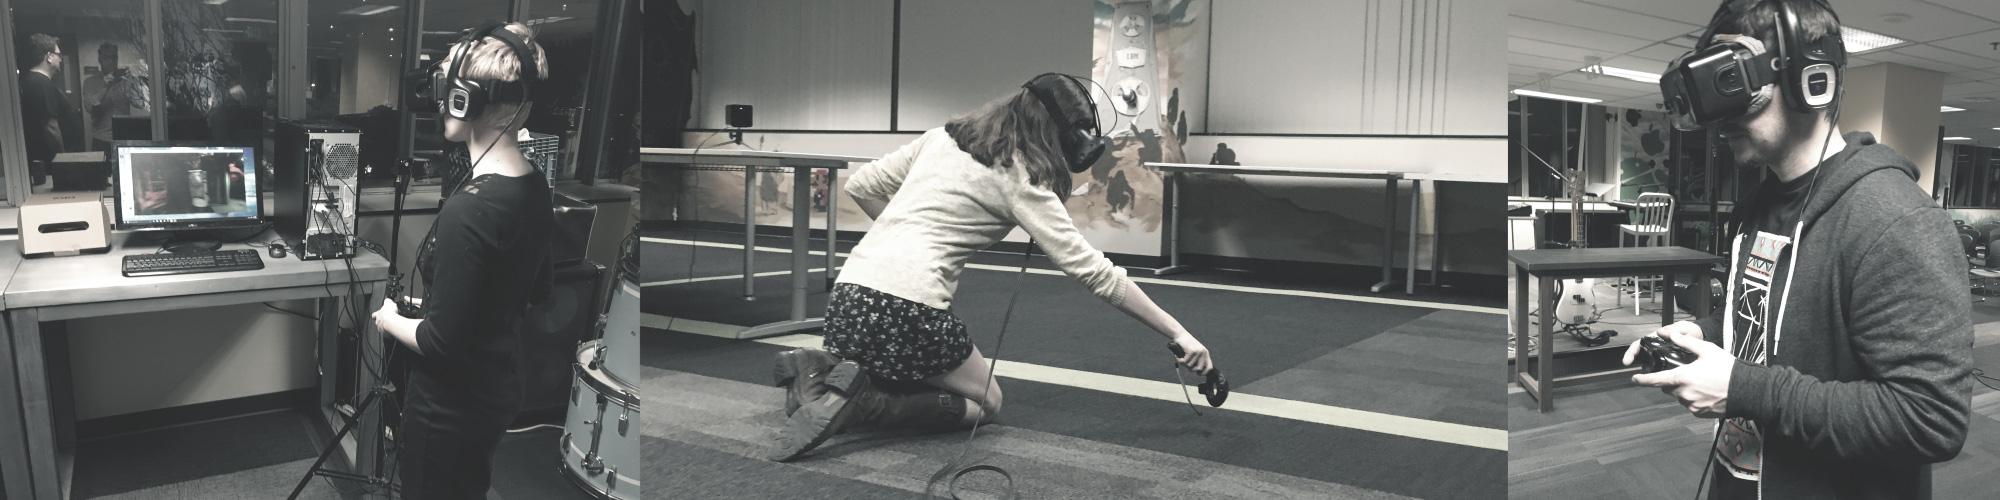 VR meetup 2_00000.jpg